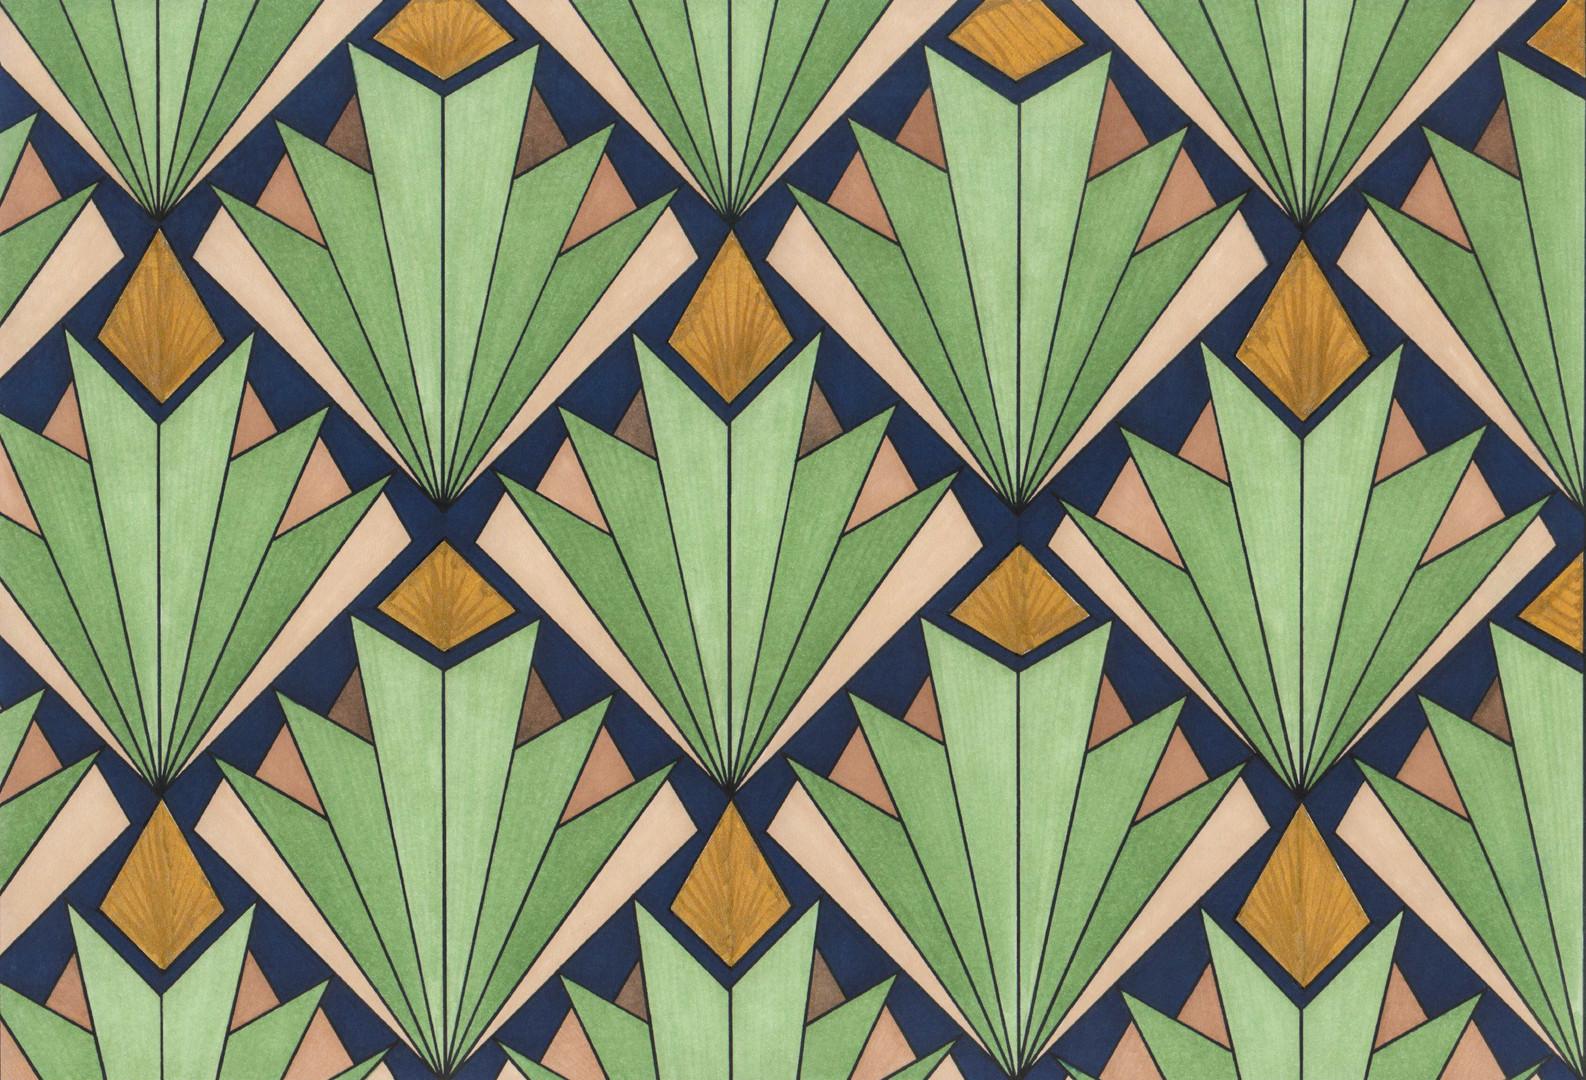 Art Deco # 3 'Succulents' illustration